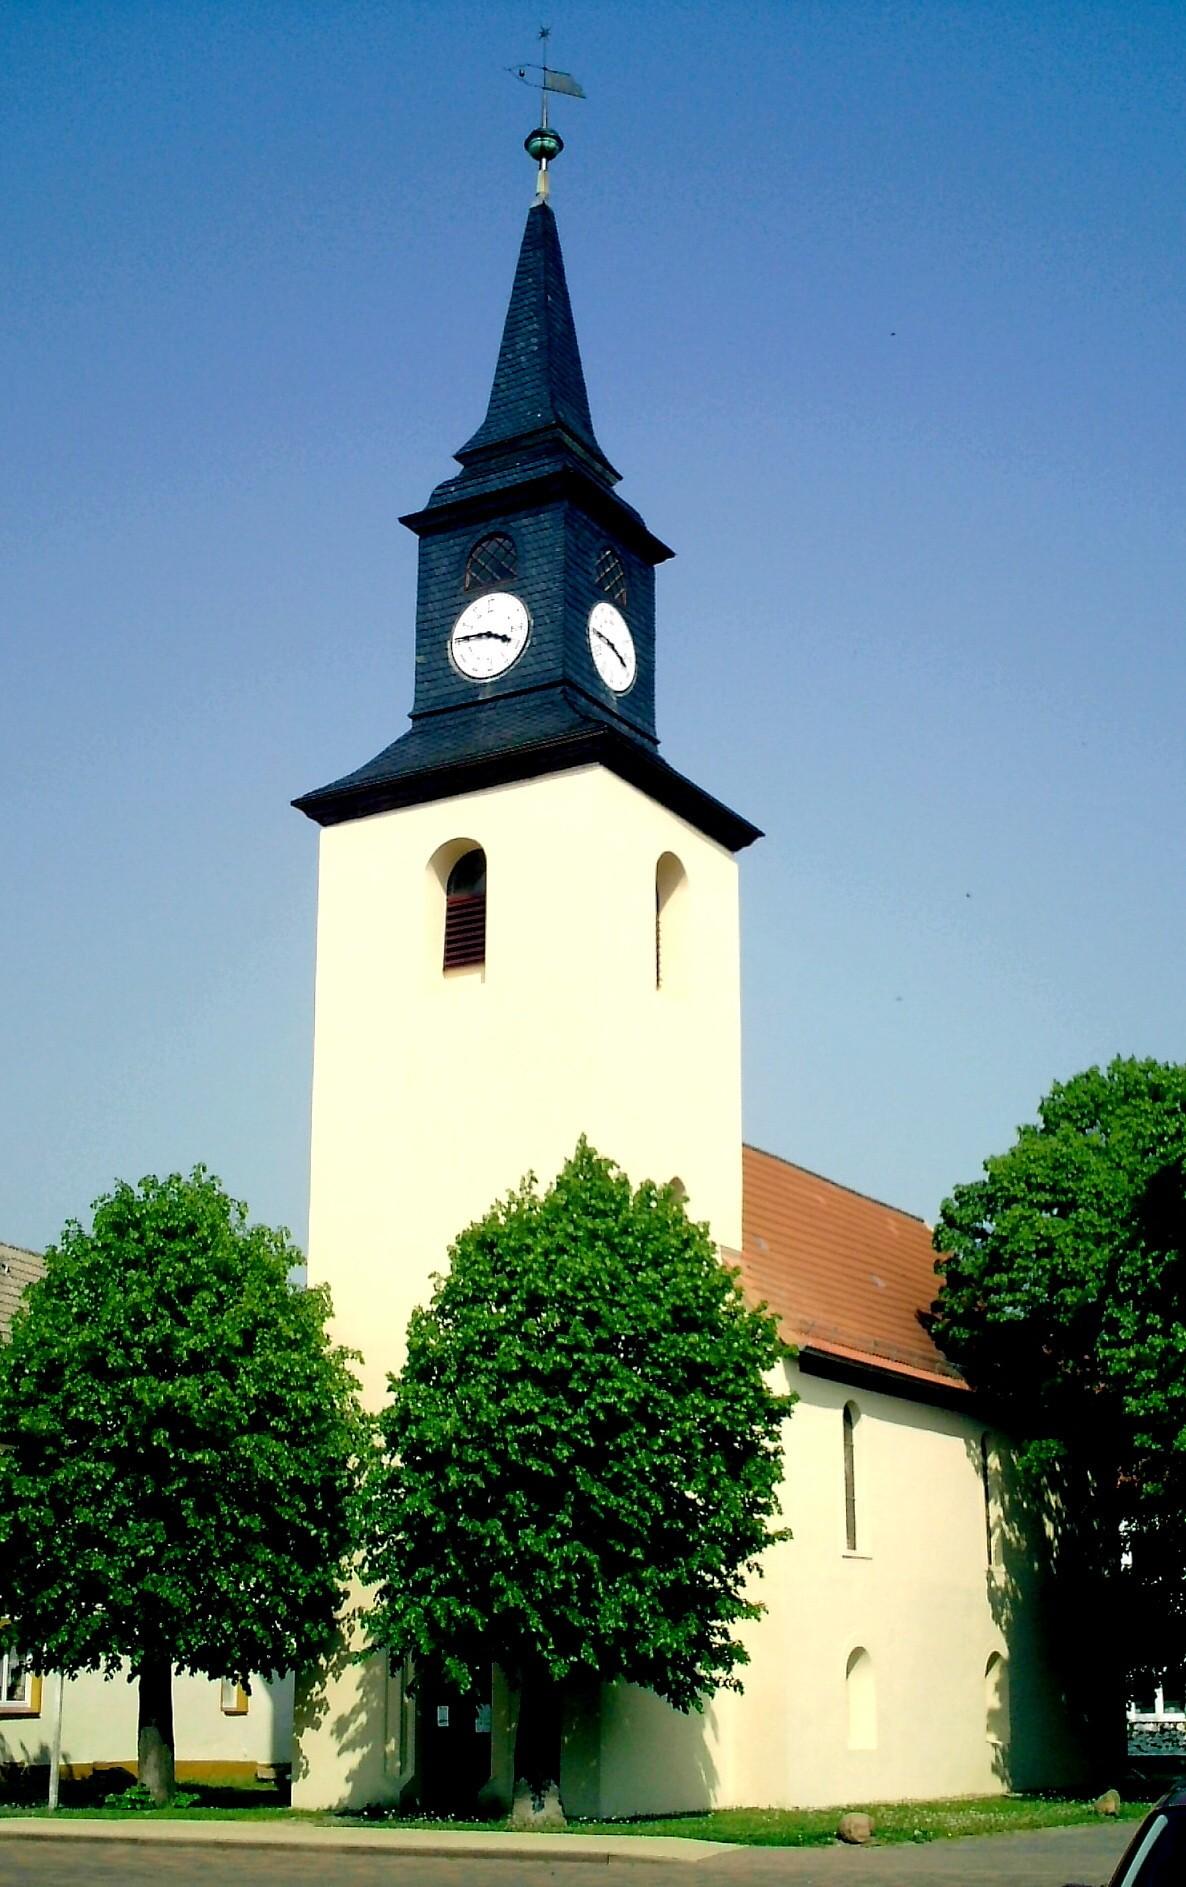 Glindenberg